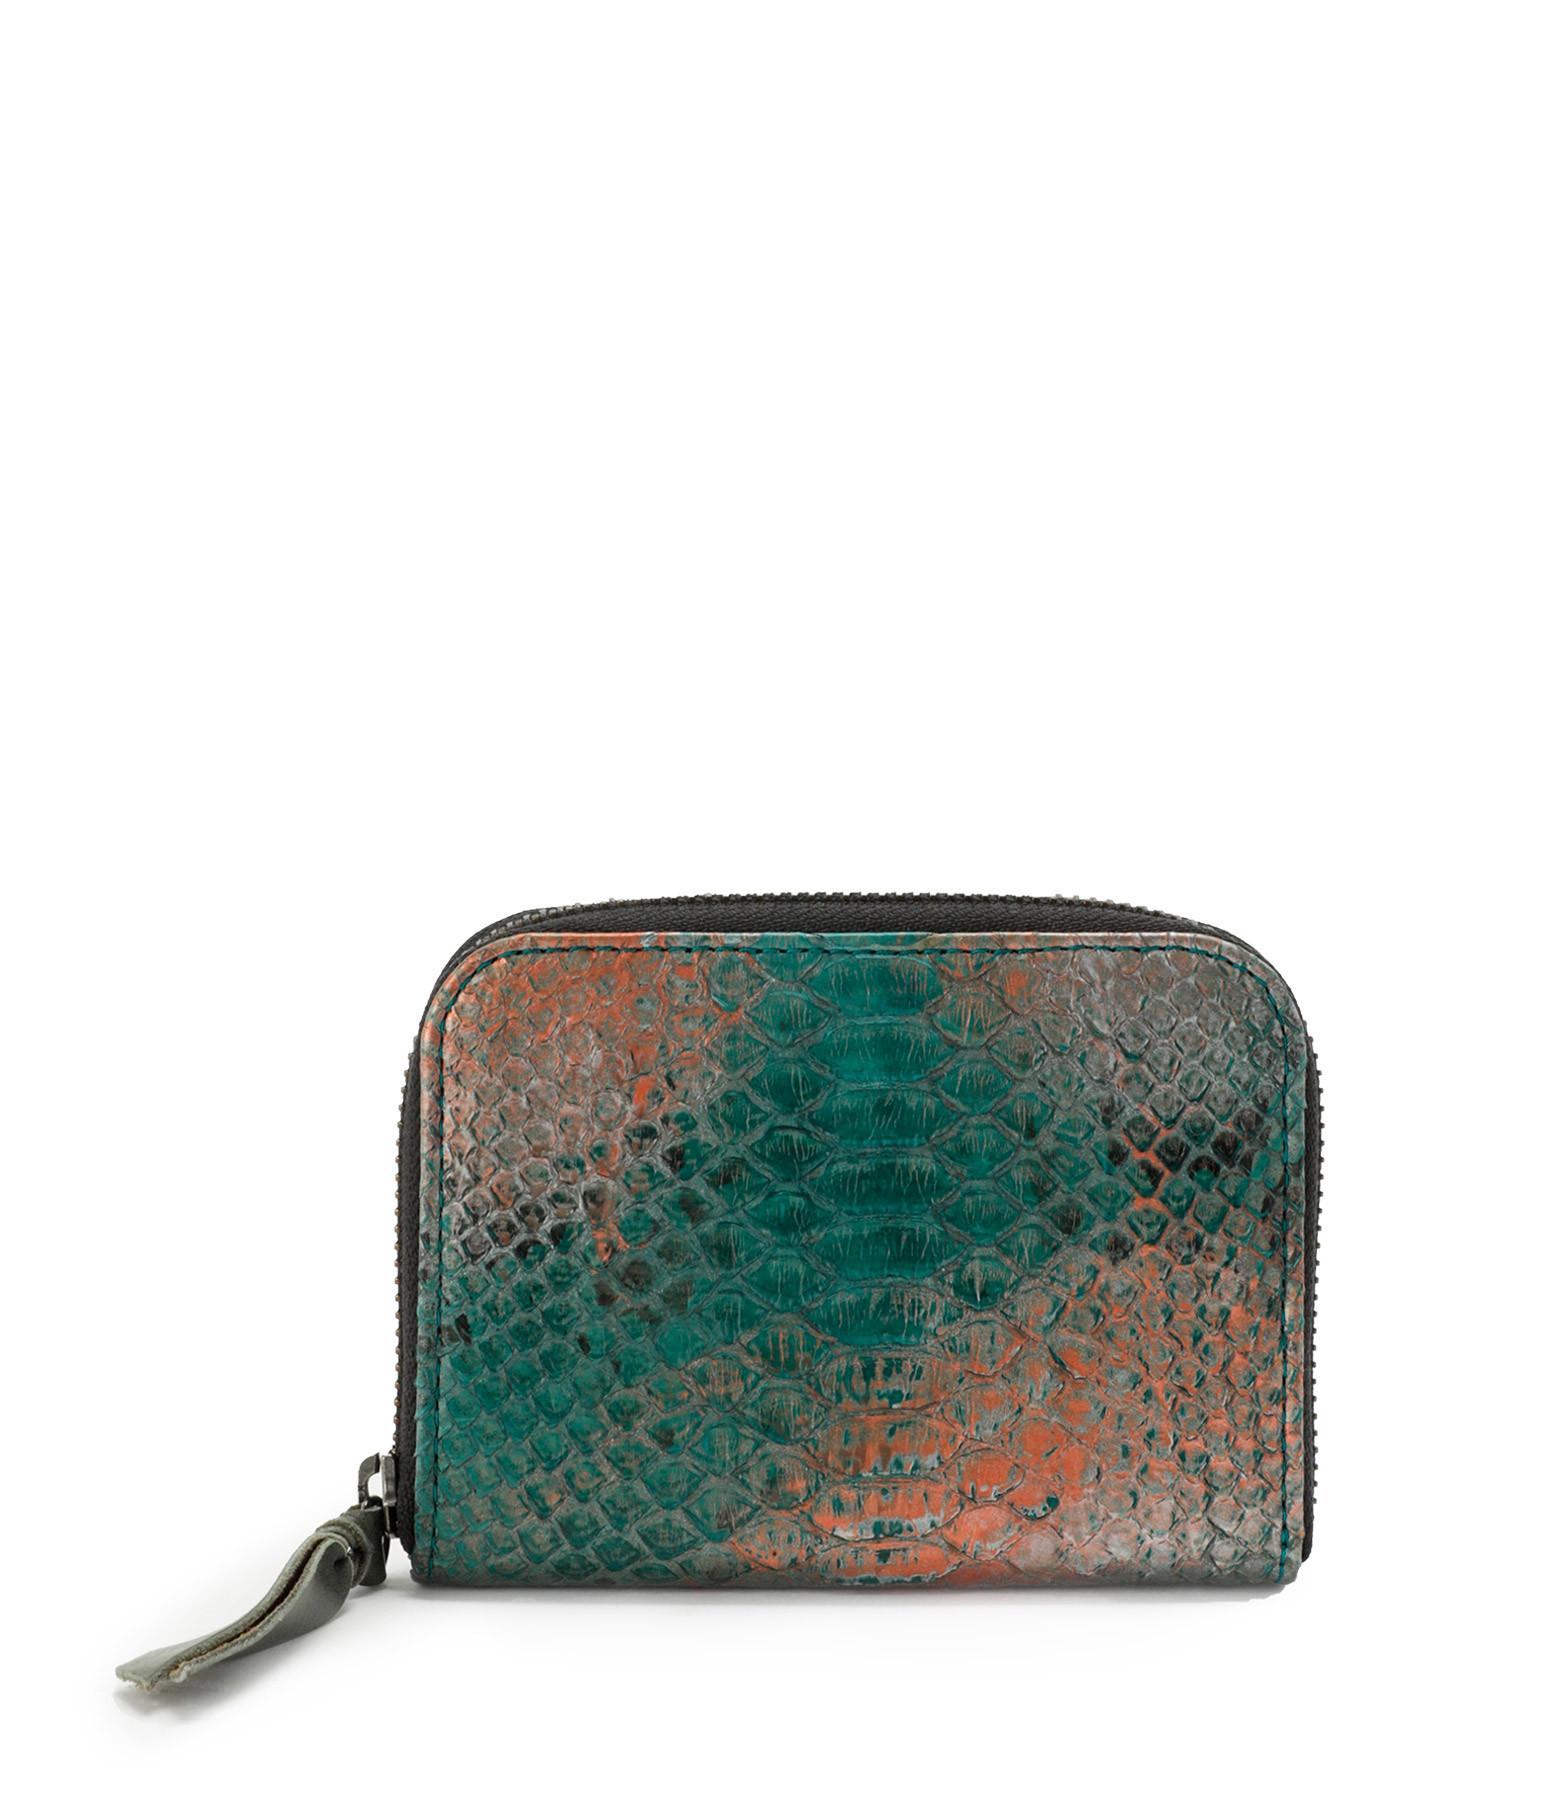 CLARIS VIROT - Porte-monnaie Mini Bob Python Aqua